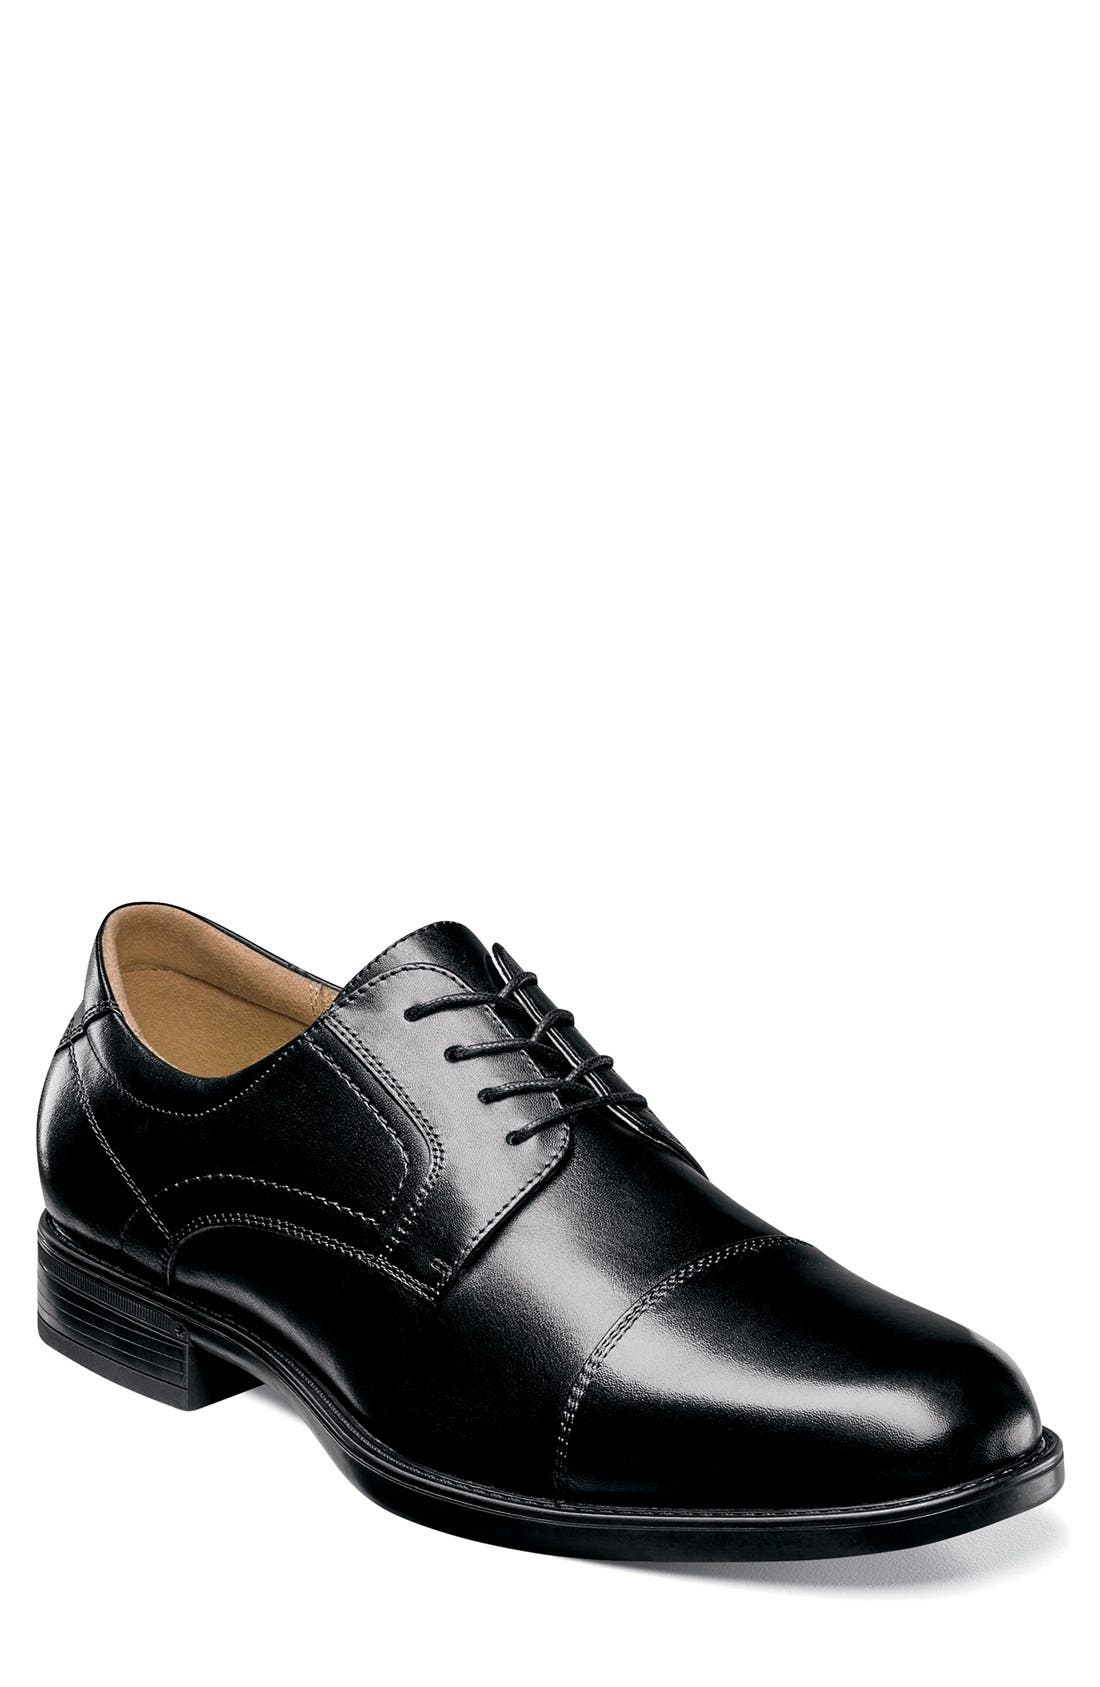 'Midtown' Cap Toe Derby,                             Main thumbnail 1, color,                             Black Leather